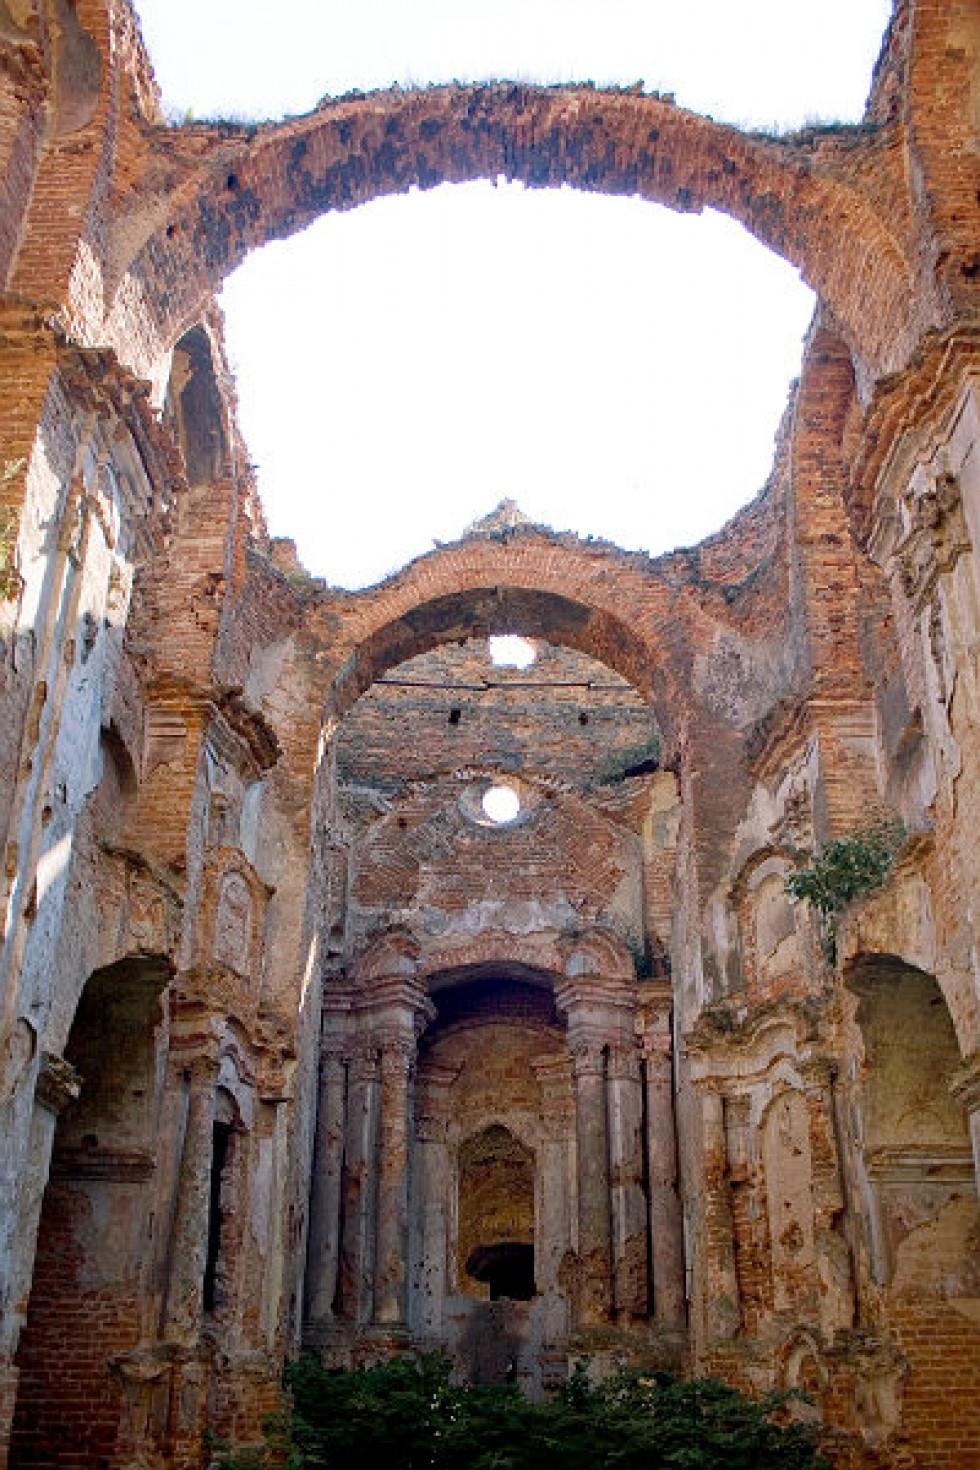 Ще одне фото Загорівського монастиря. З lumitar.blogspot.com